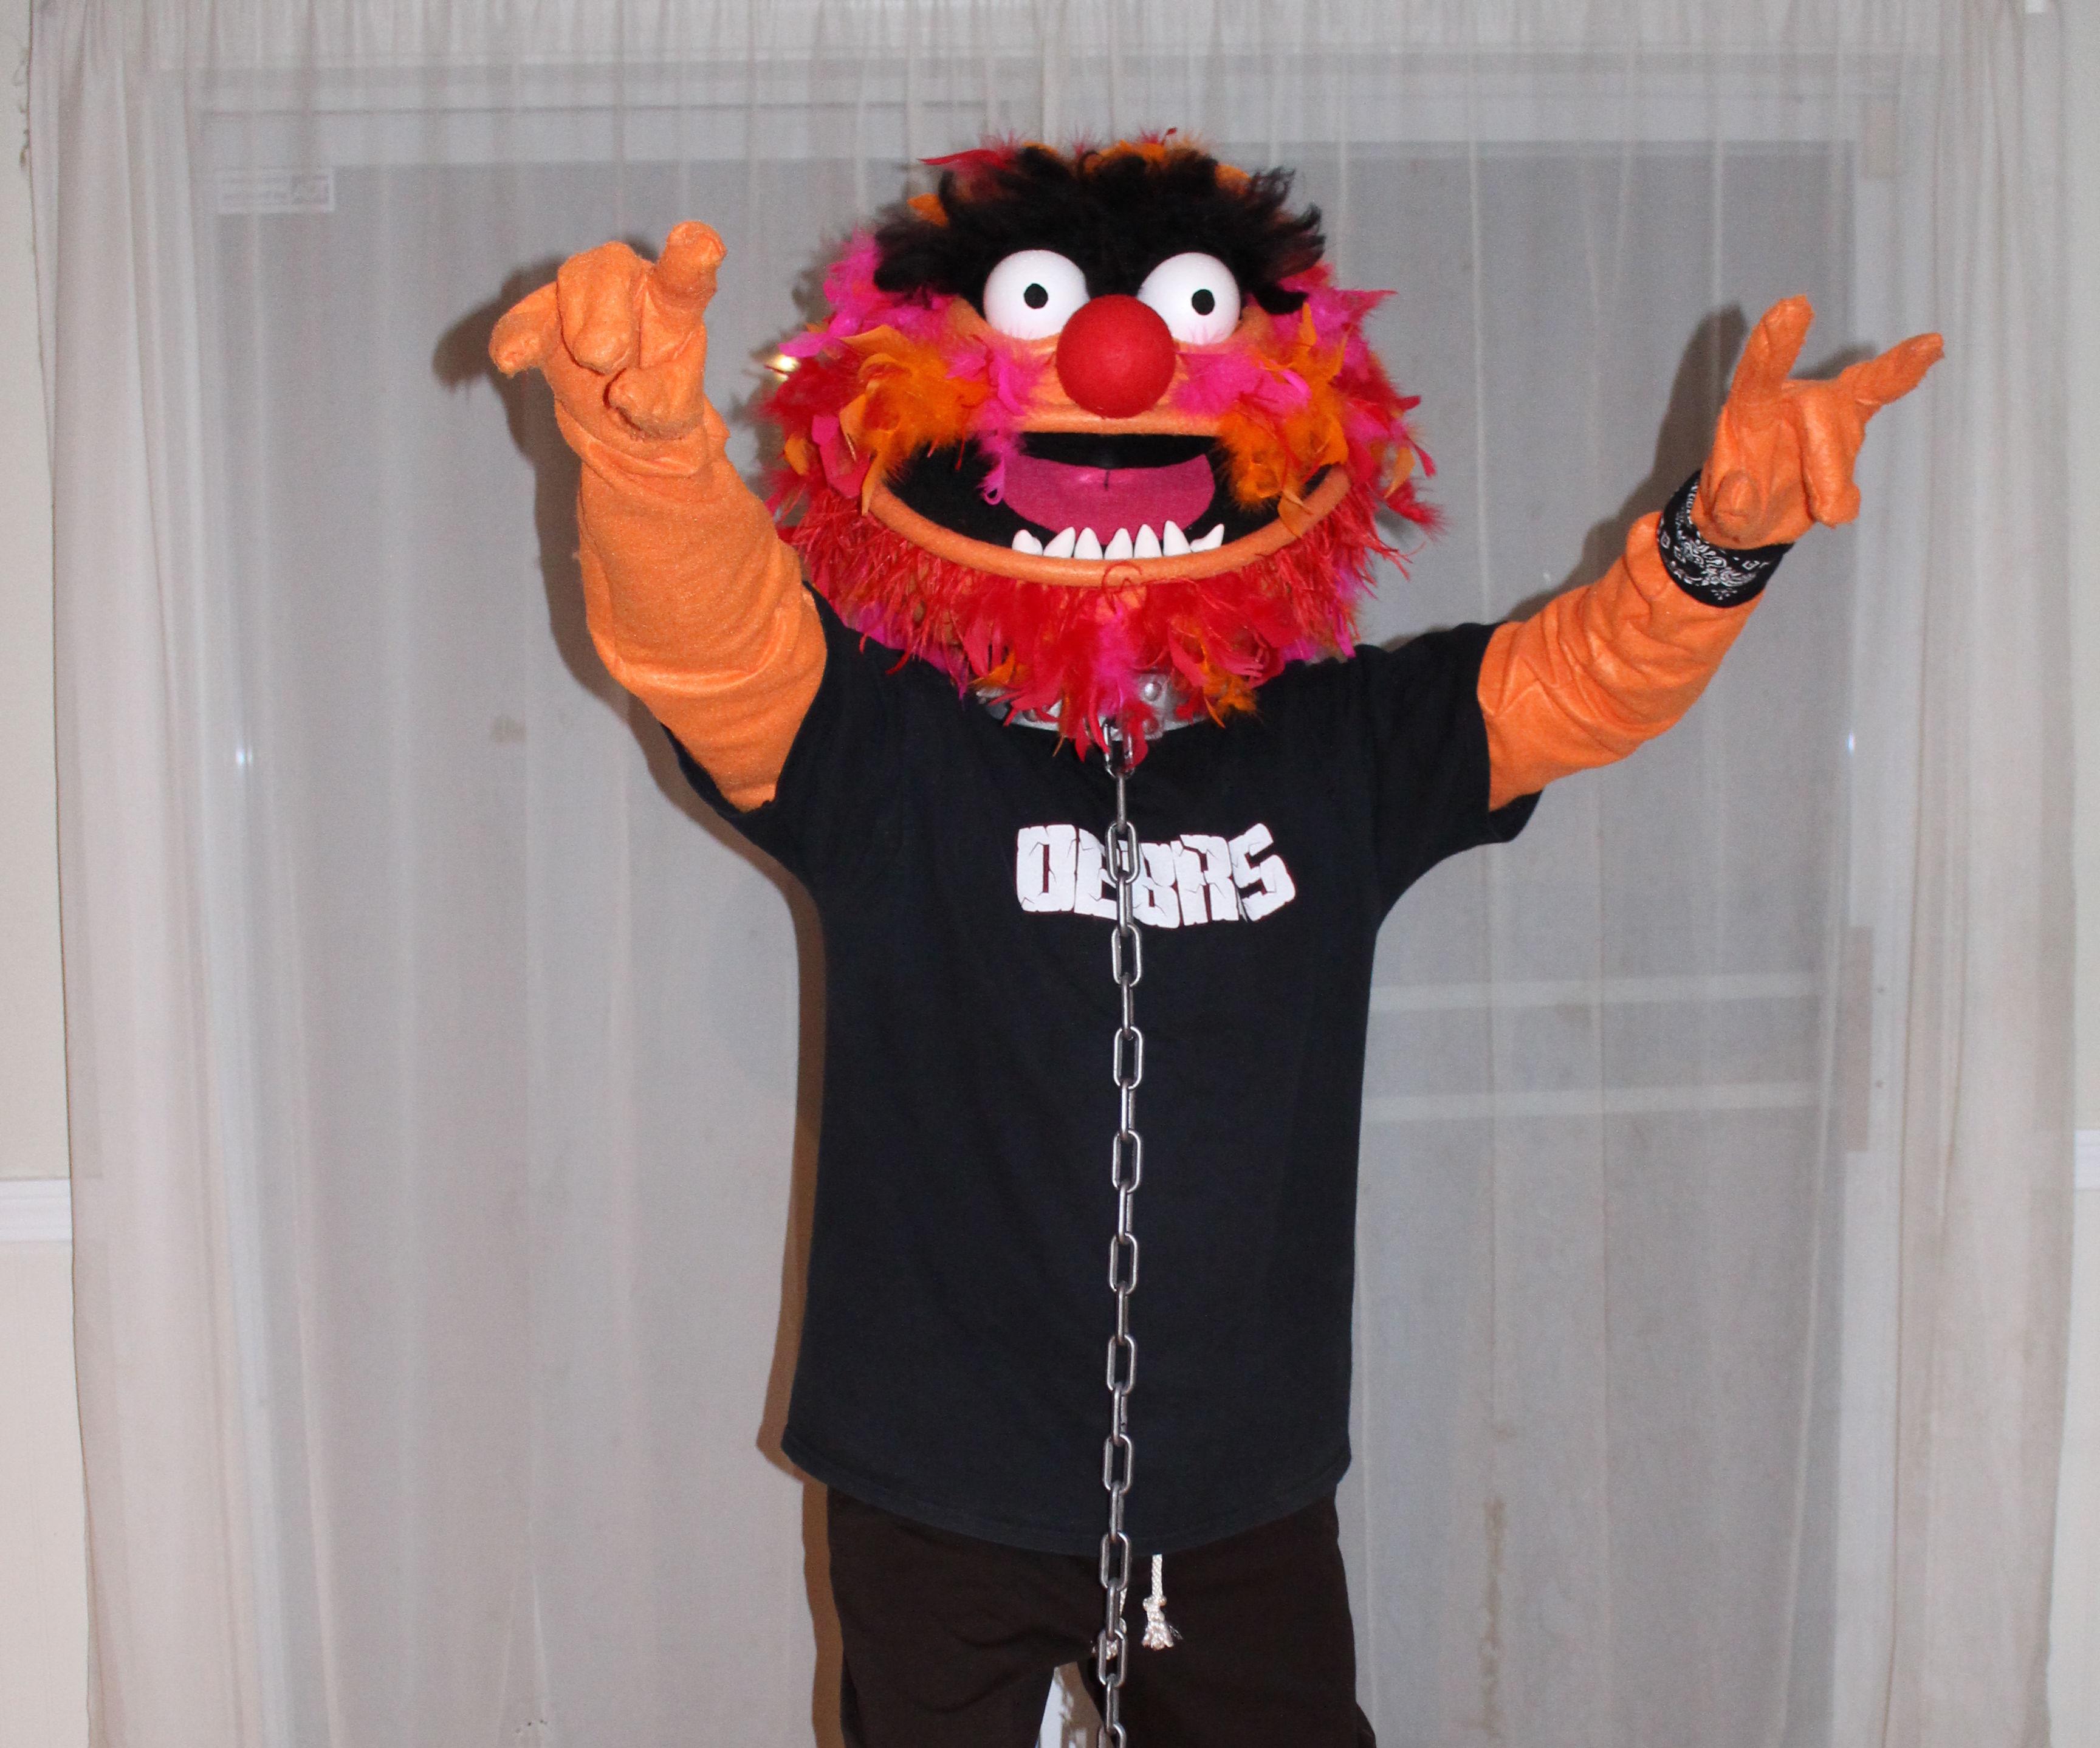 The Animal (Muppet) Costume